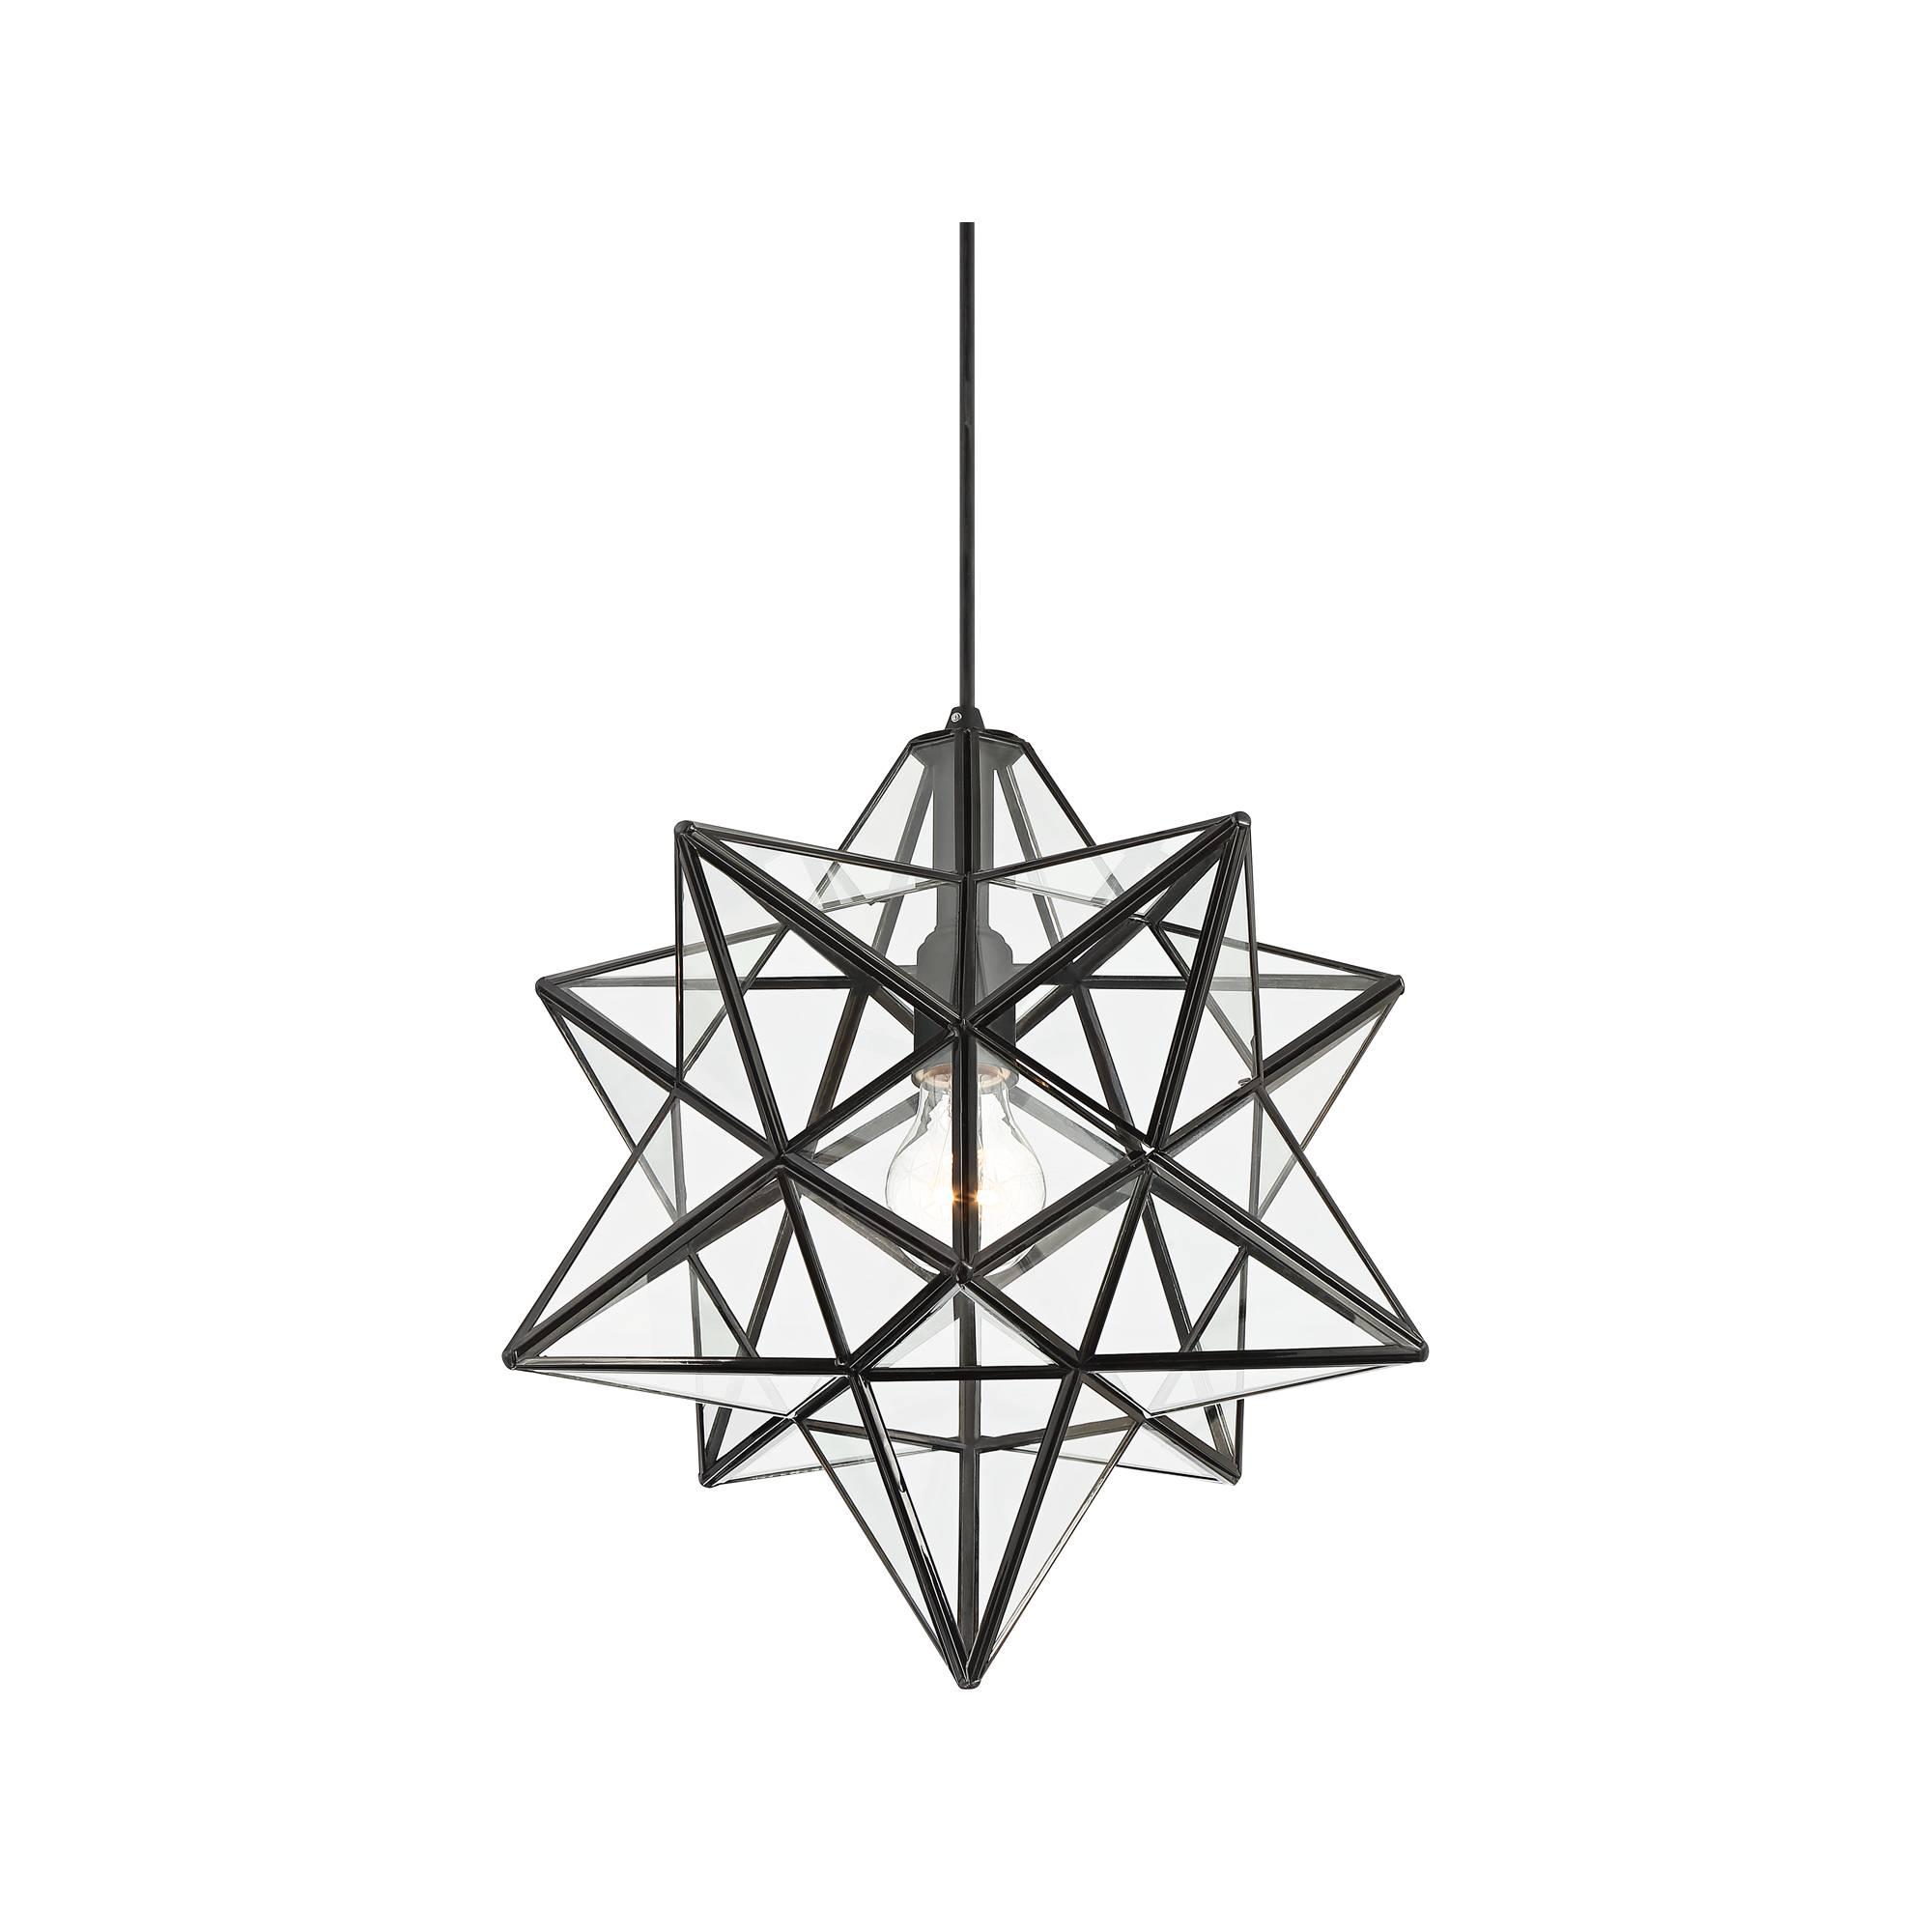 moravian plastic pendant artistic mini fixturemoravian fixture ceiling outdoor pottery star cute lighting mount flush barnmoravian light lights